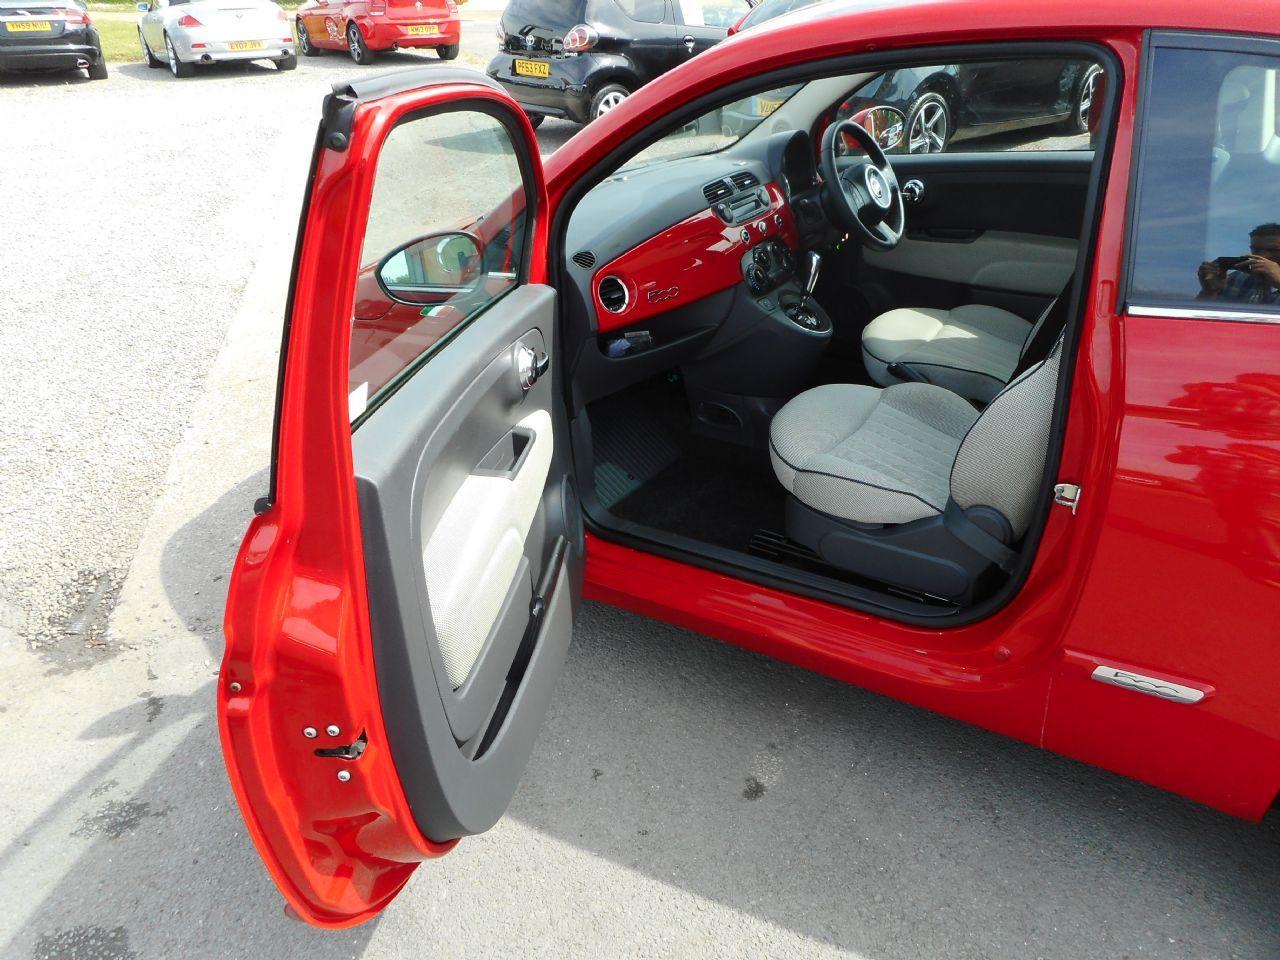 FIAT 500 1.2i Lounge S/S AUTO (2011) - Picture 10